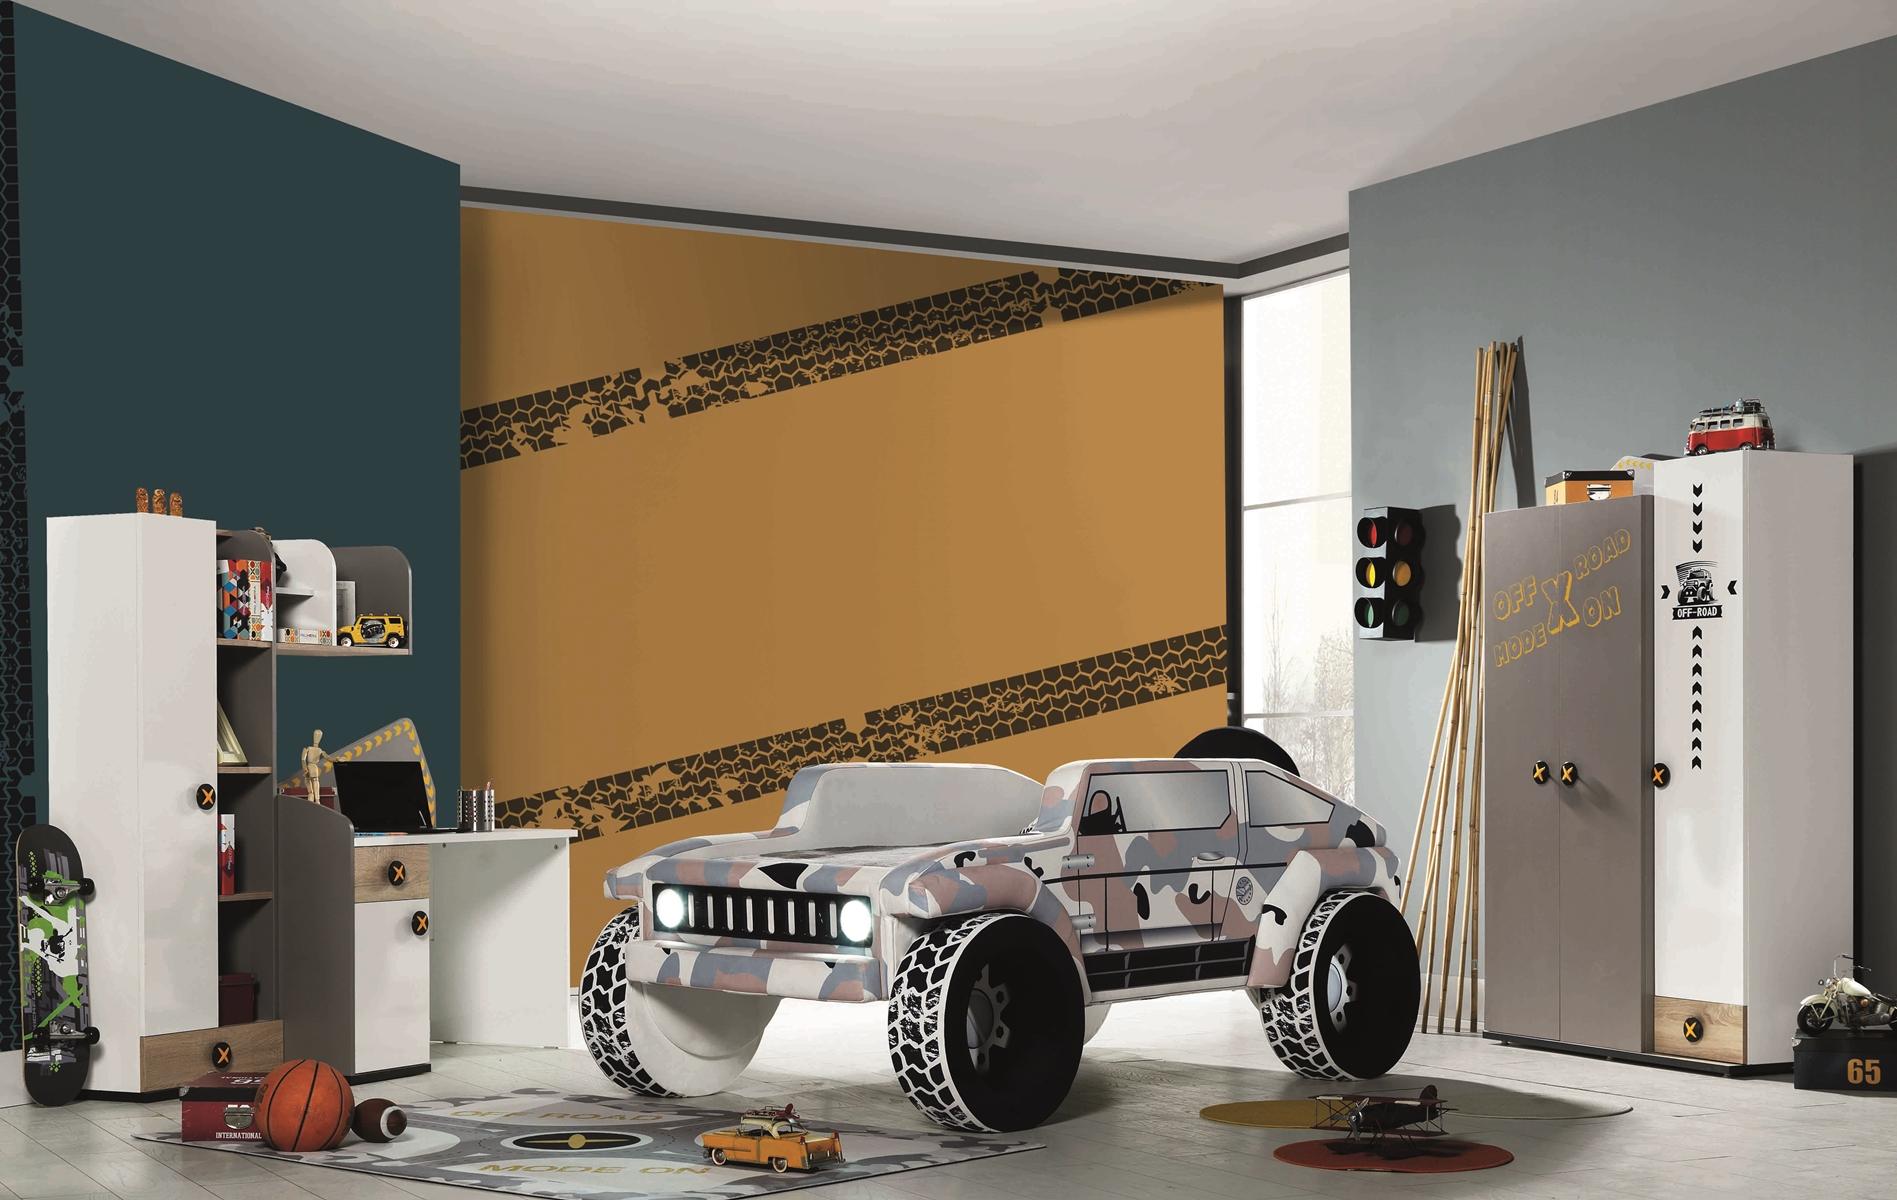 Autobettzimmer Set Jeep Grün 5-teilig gepolstert LEDs